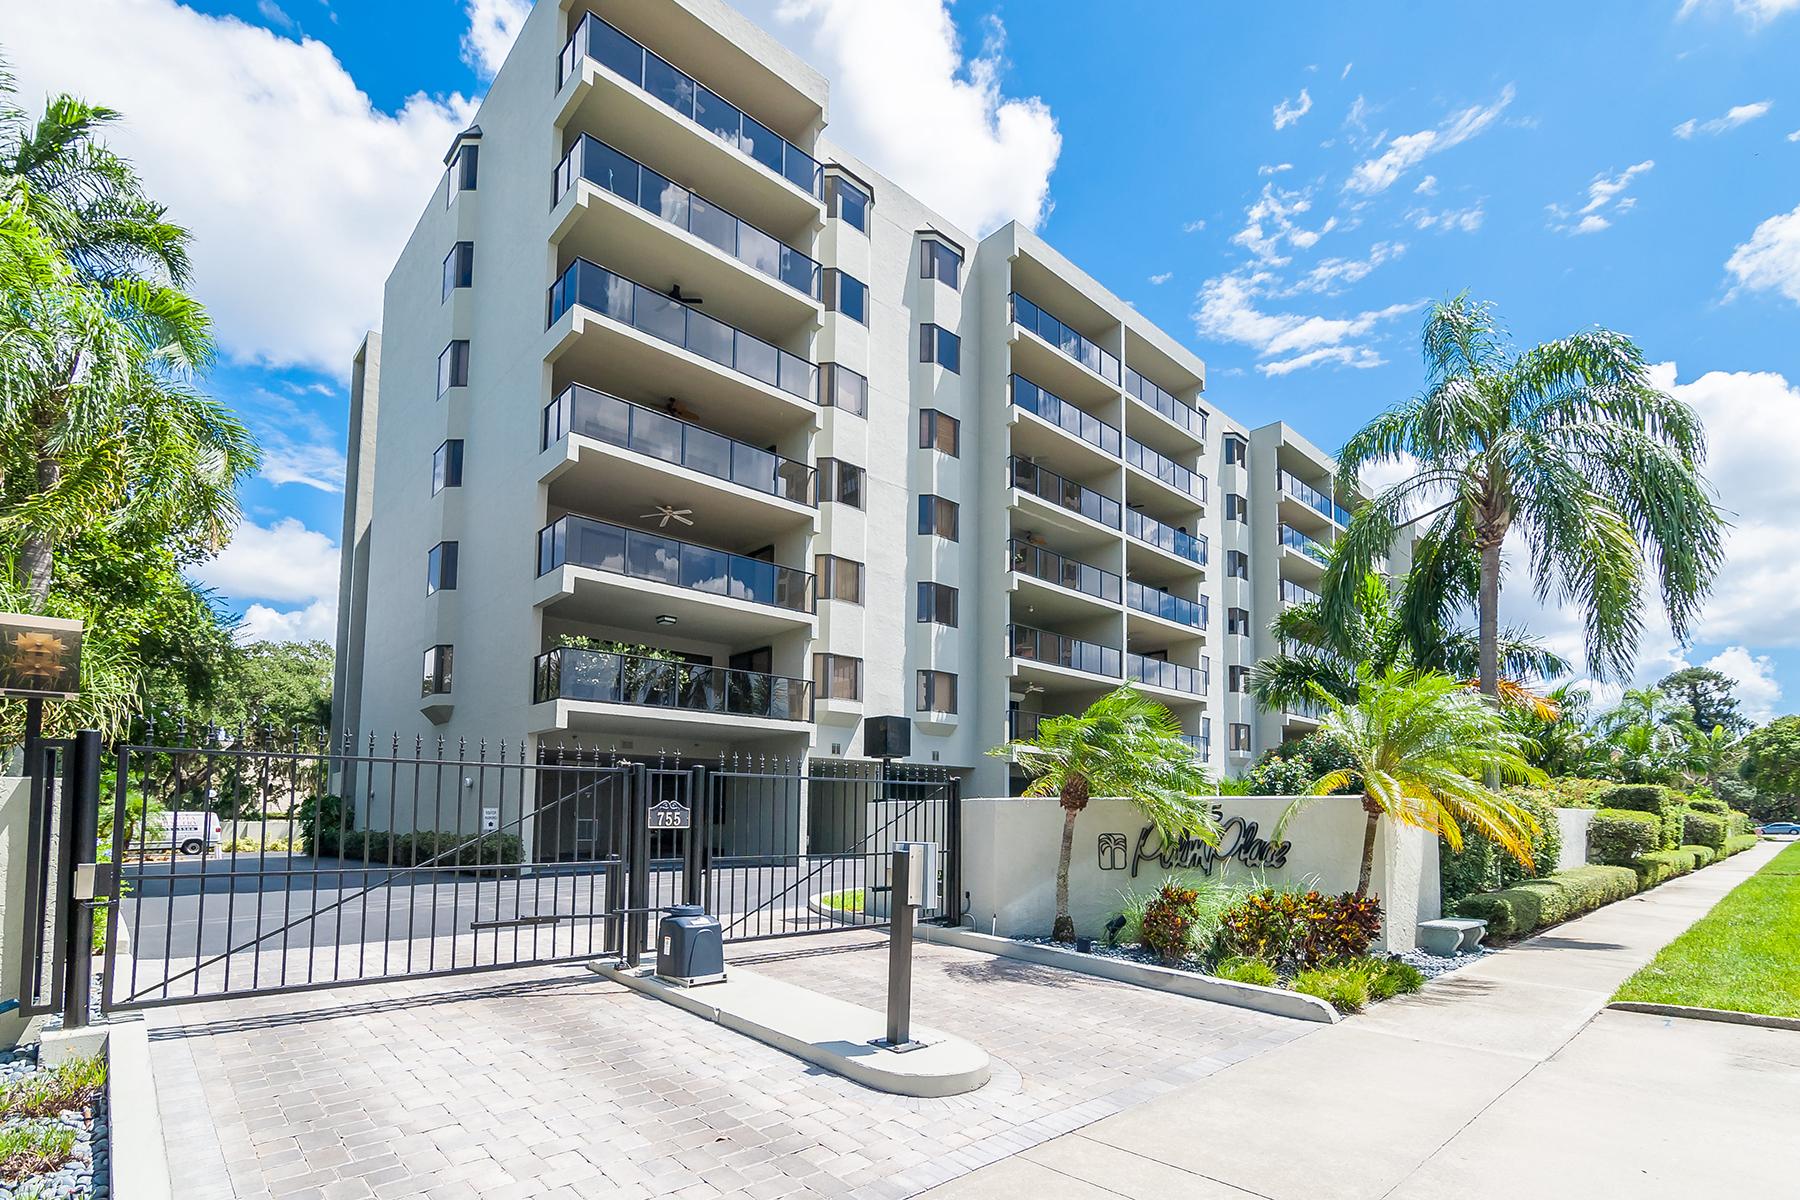 Condominium for Sale at PALM PLAZA 755 S Palm Ave 104 Sarasota, Florida, 34236 United States